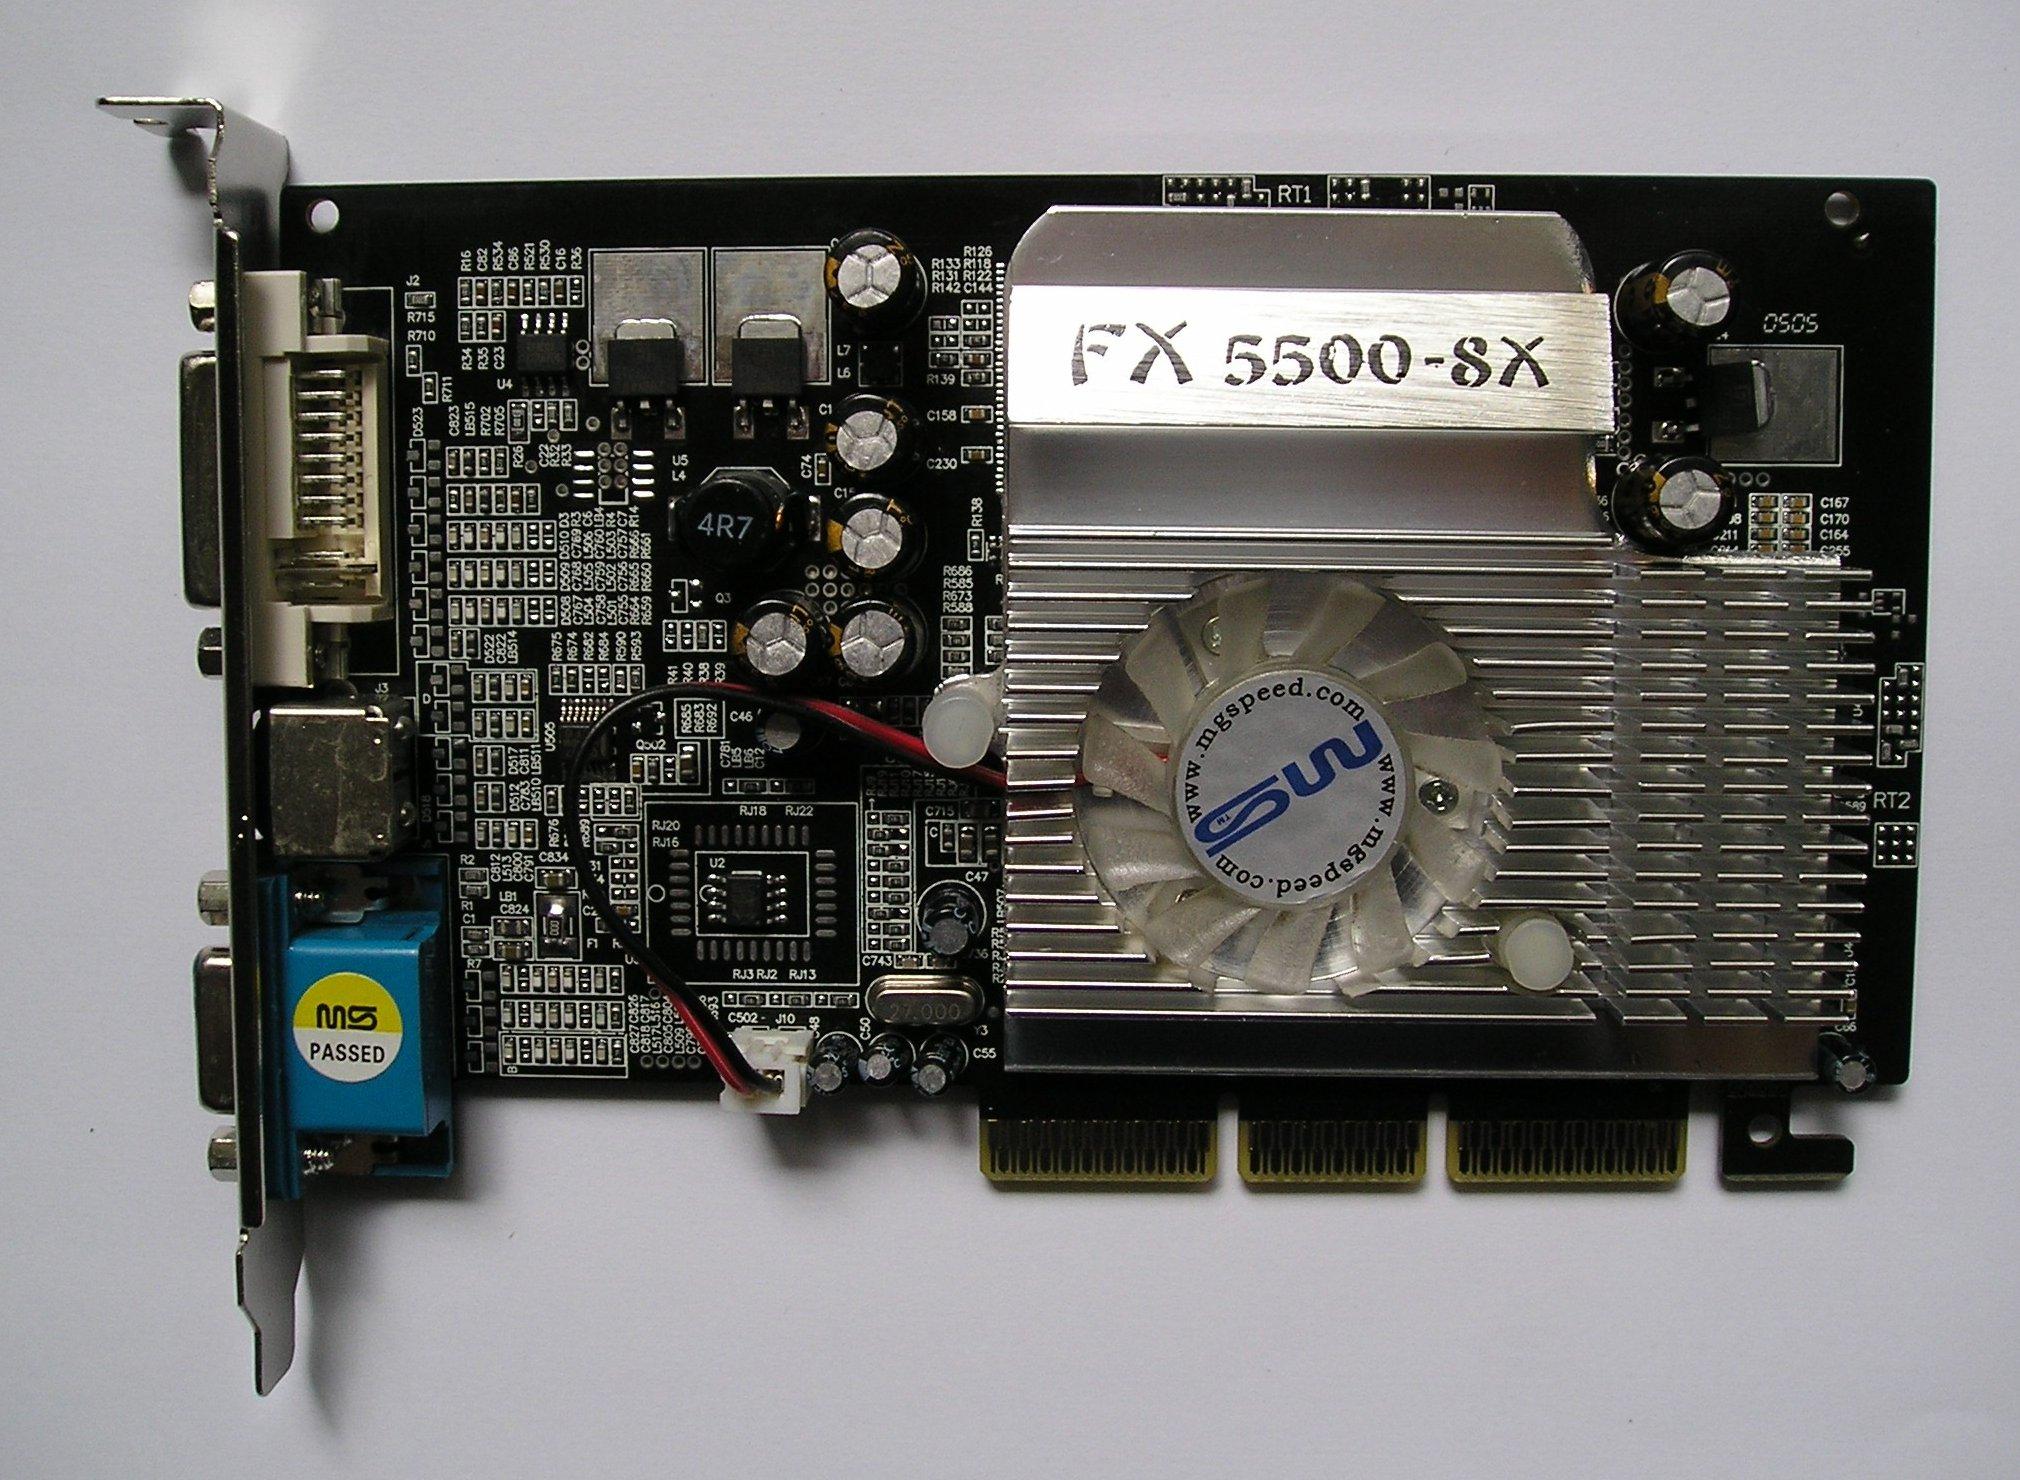 Nvidia geforce fx 5500 / 256mb ddr / agp 8x / dvi / vga / tv-out.